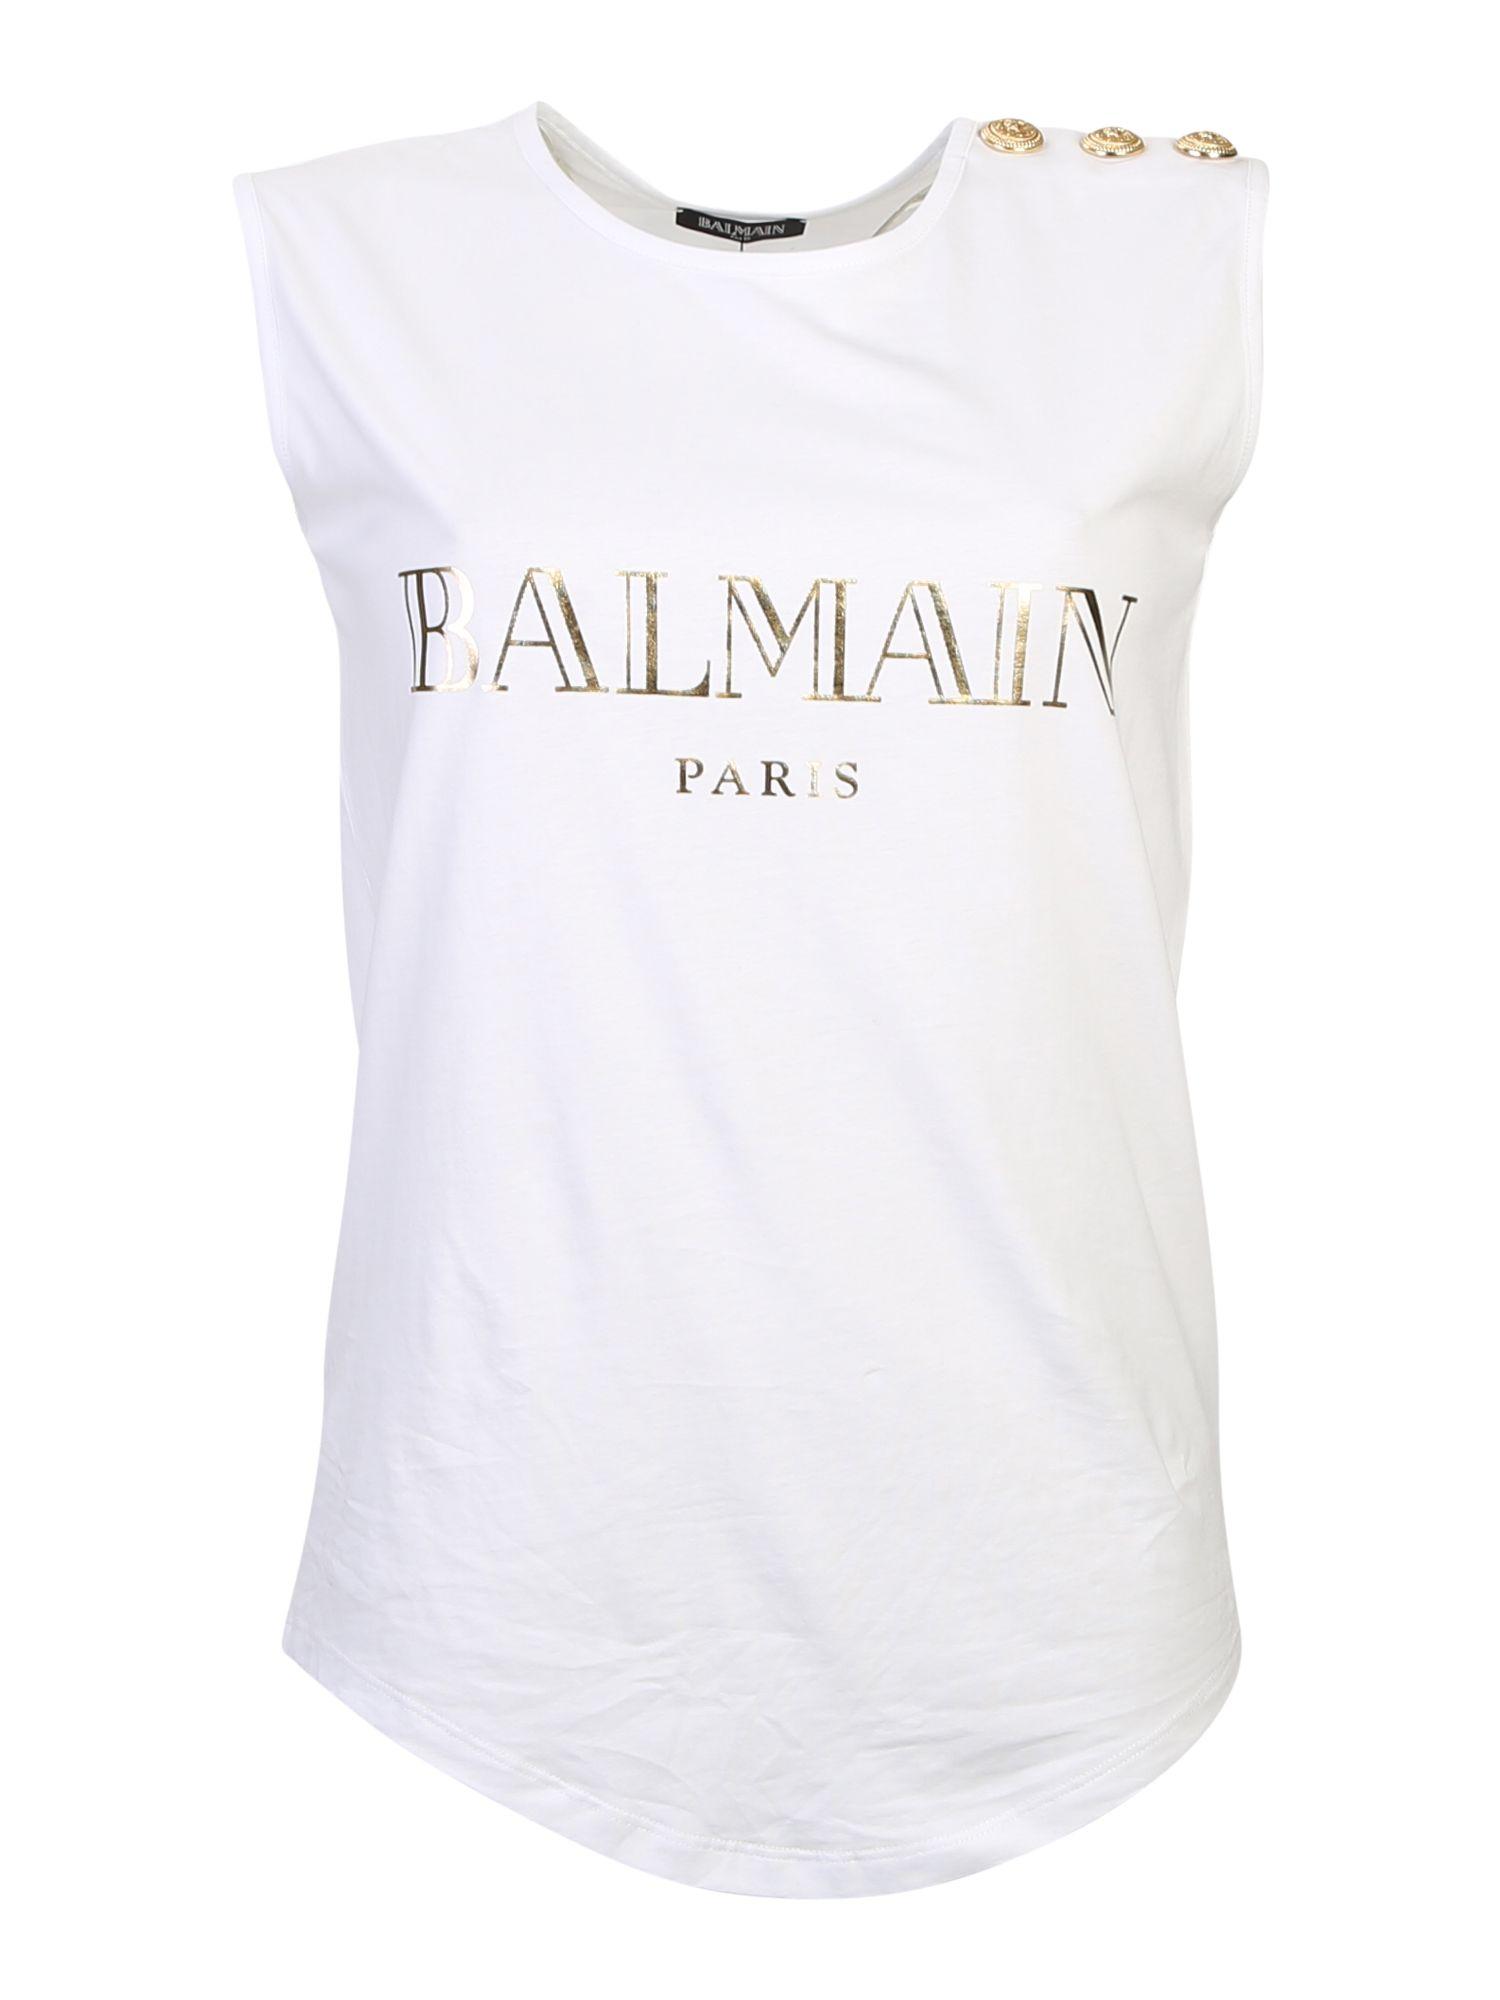 Balmain white sleeveless logo t shirt modesens for Balmain white logo t shirt